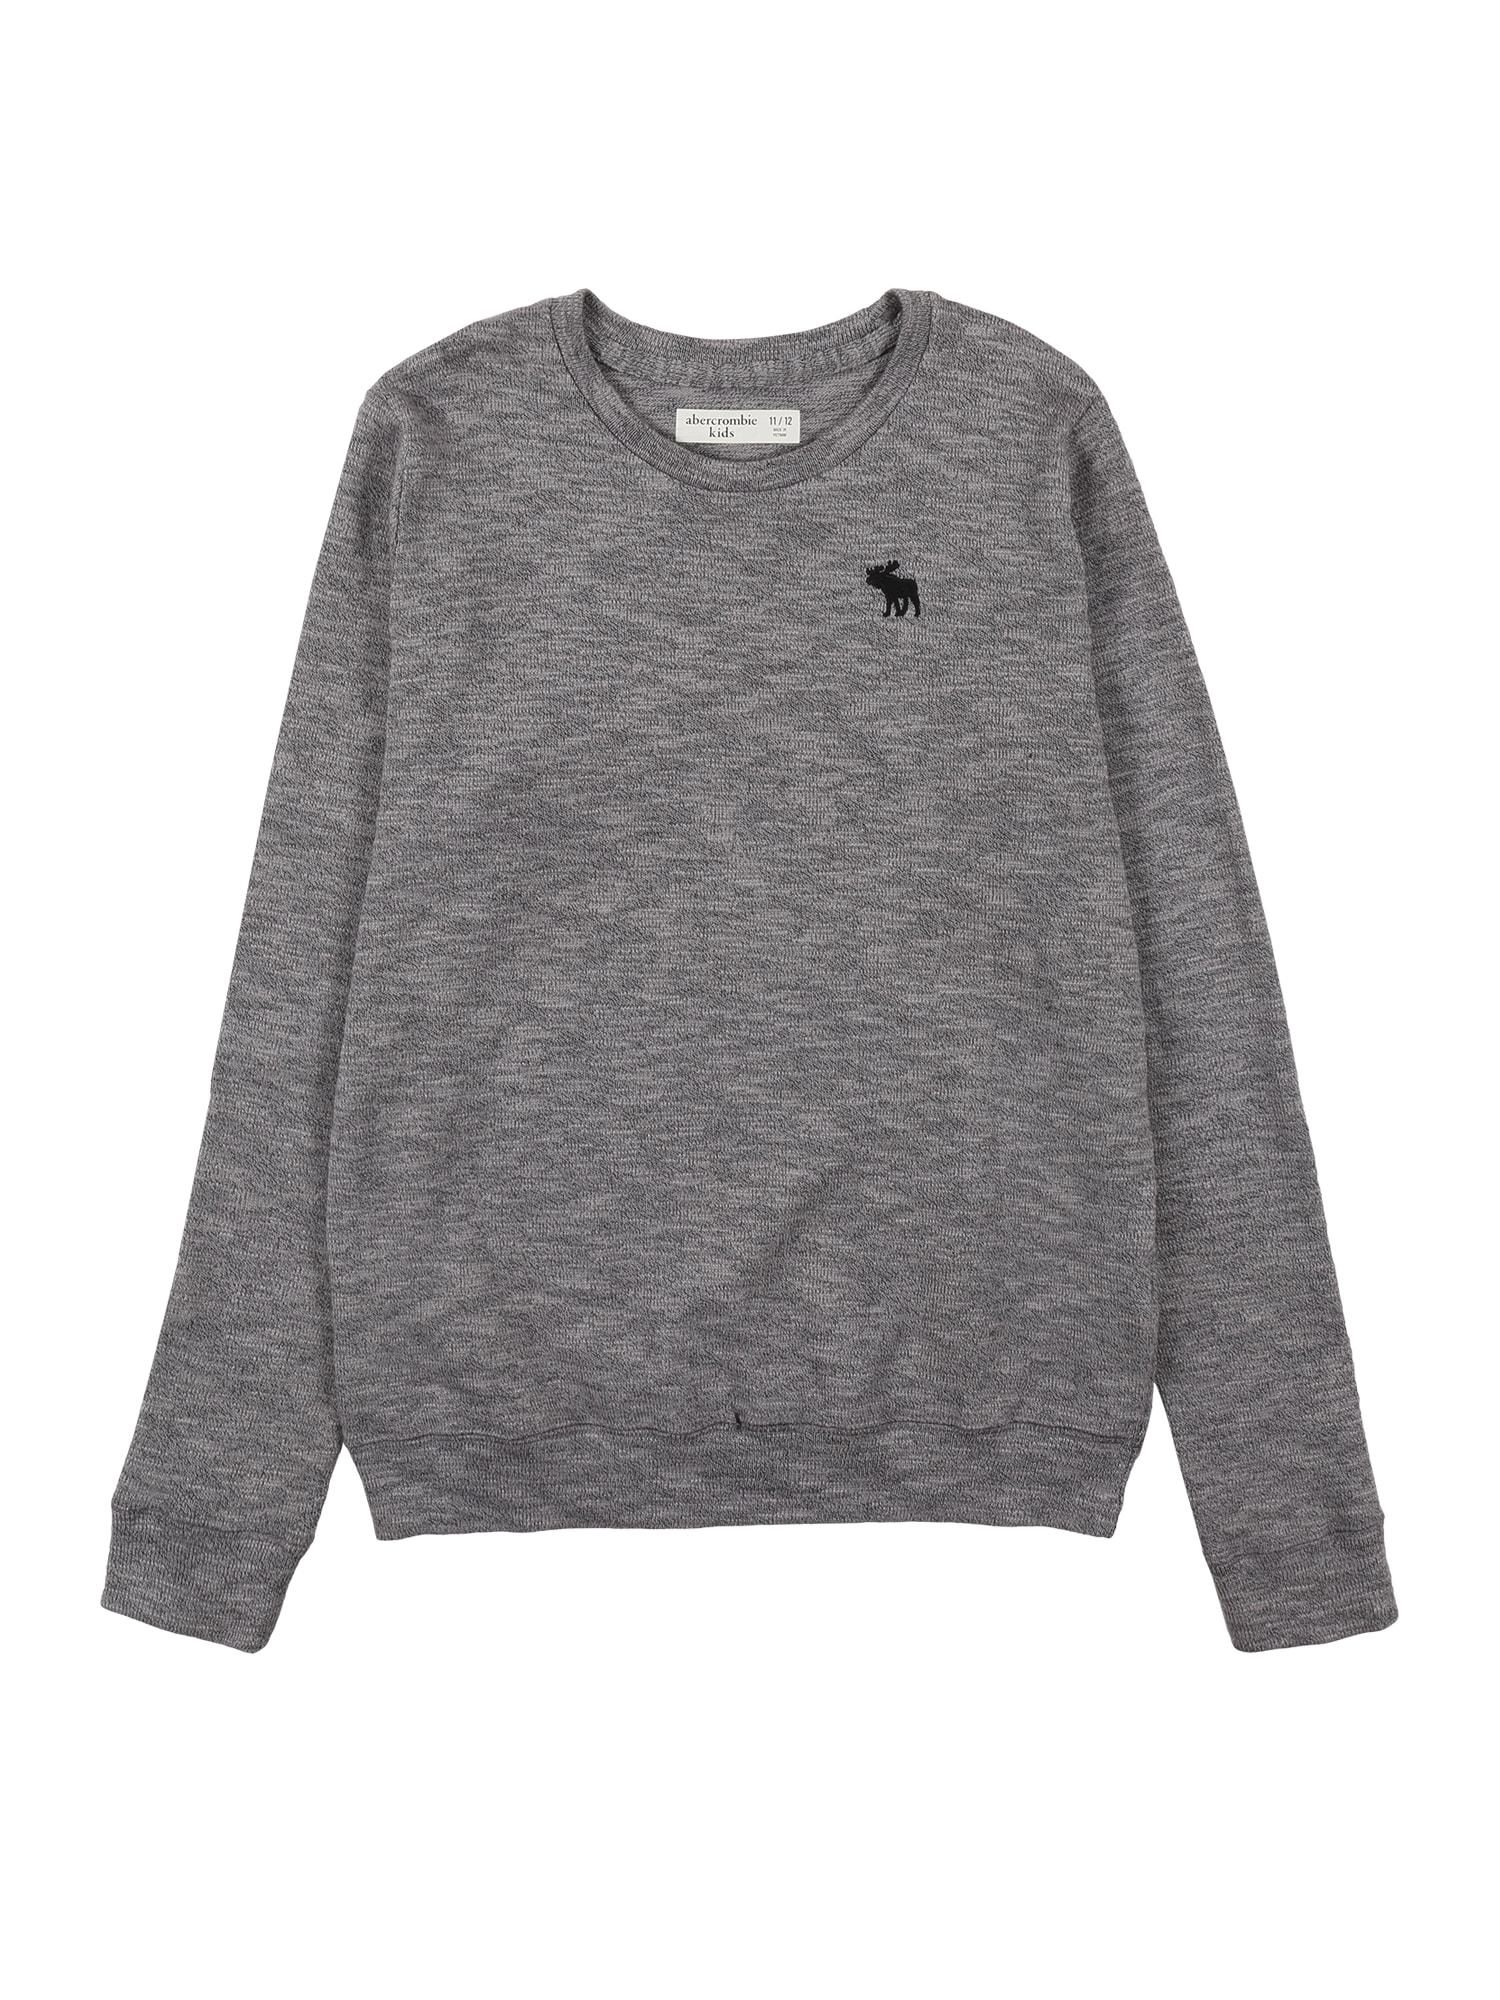 Abercrombie & Fitch Megztinis margai pilka / juoda / šviesiai pilka